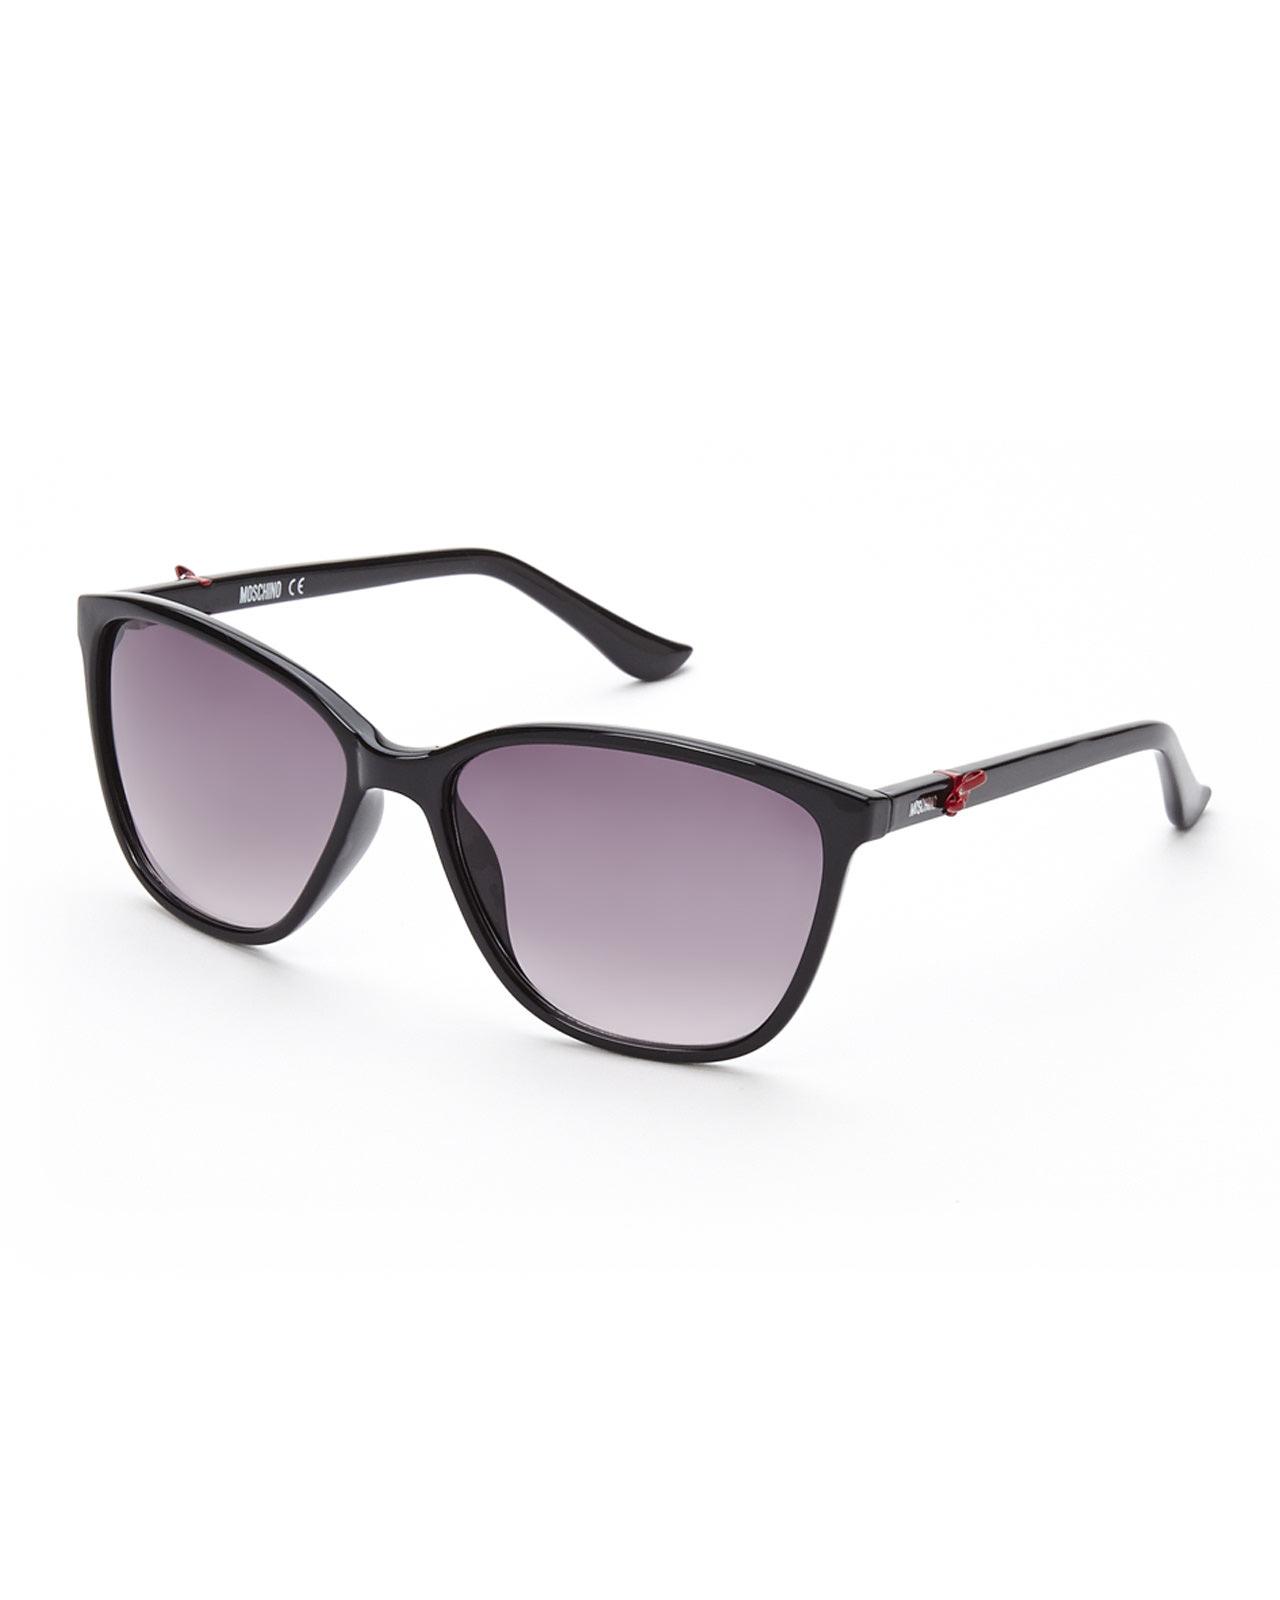 d0ad38269cc Lyst - Moschino Mo65004S Black Wayfarer Sunglasses in Black